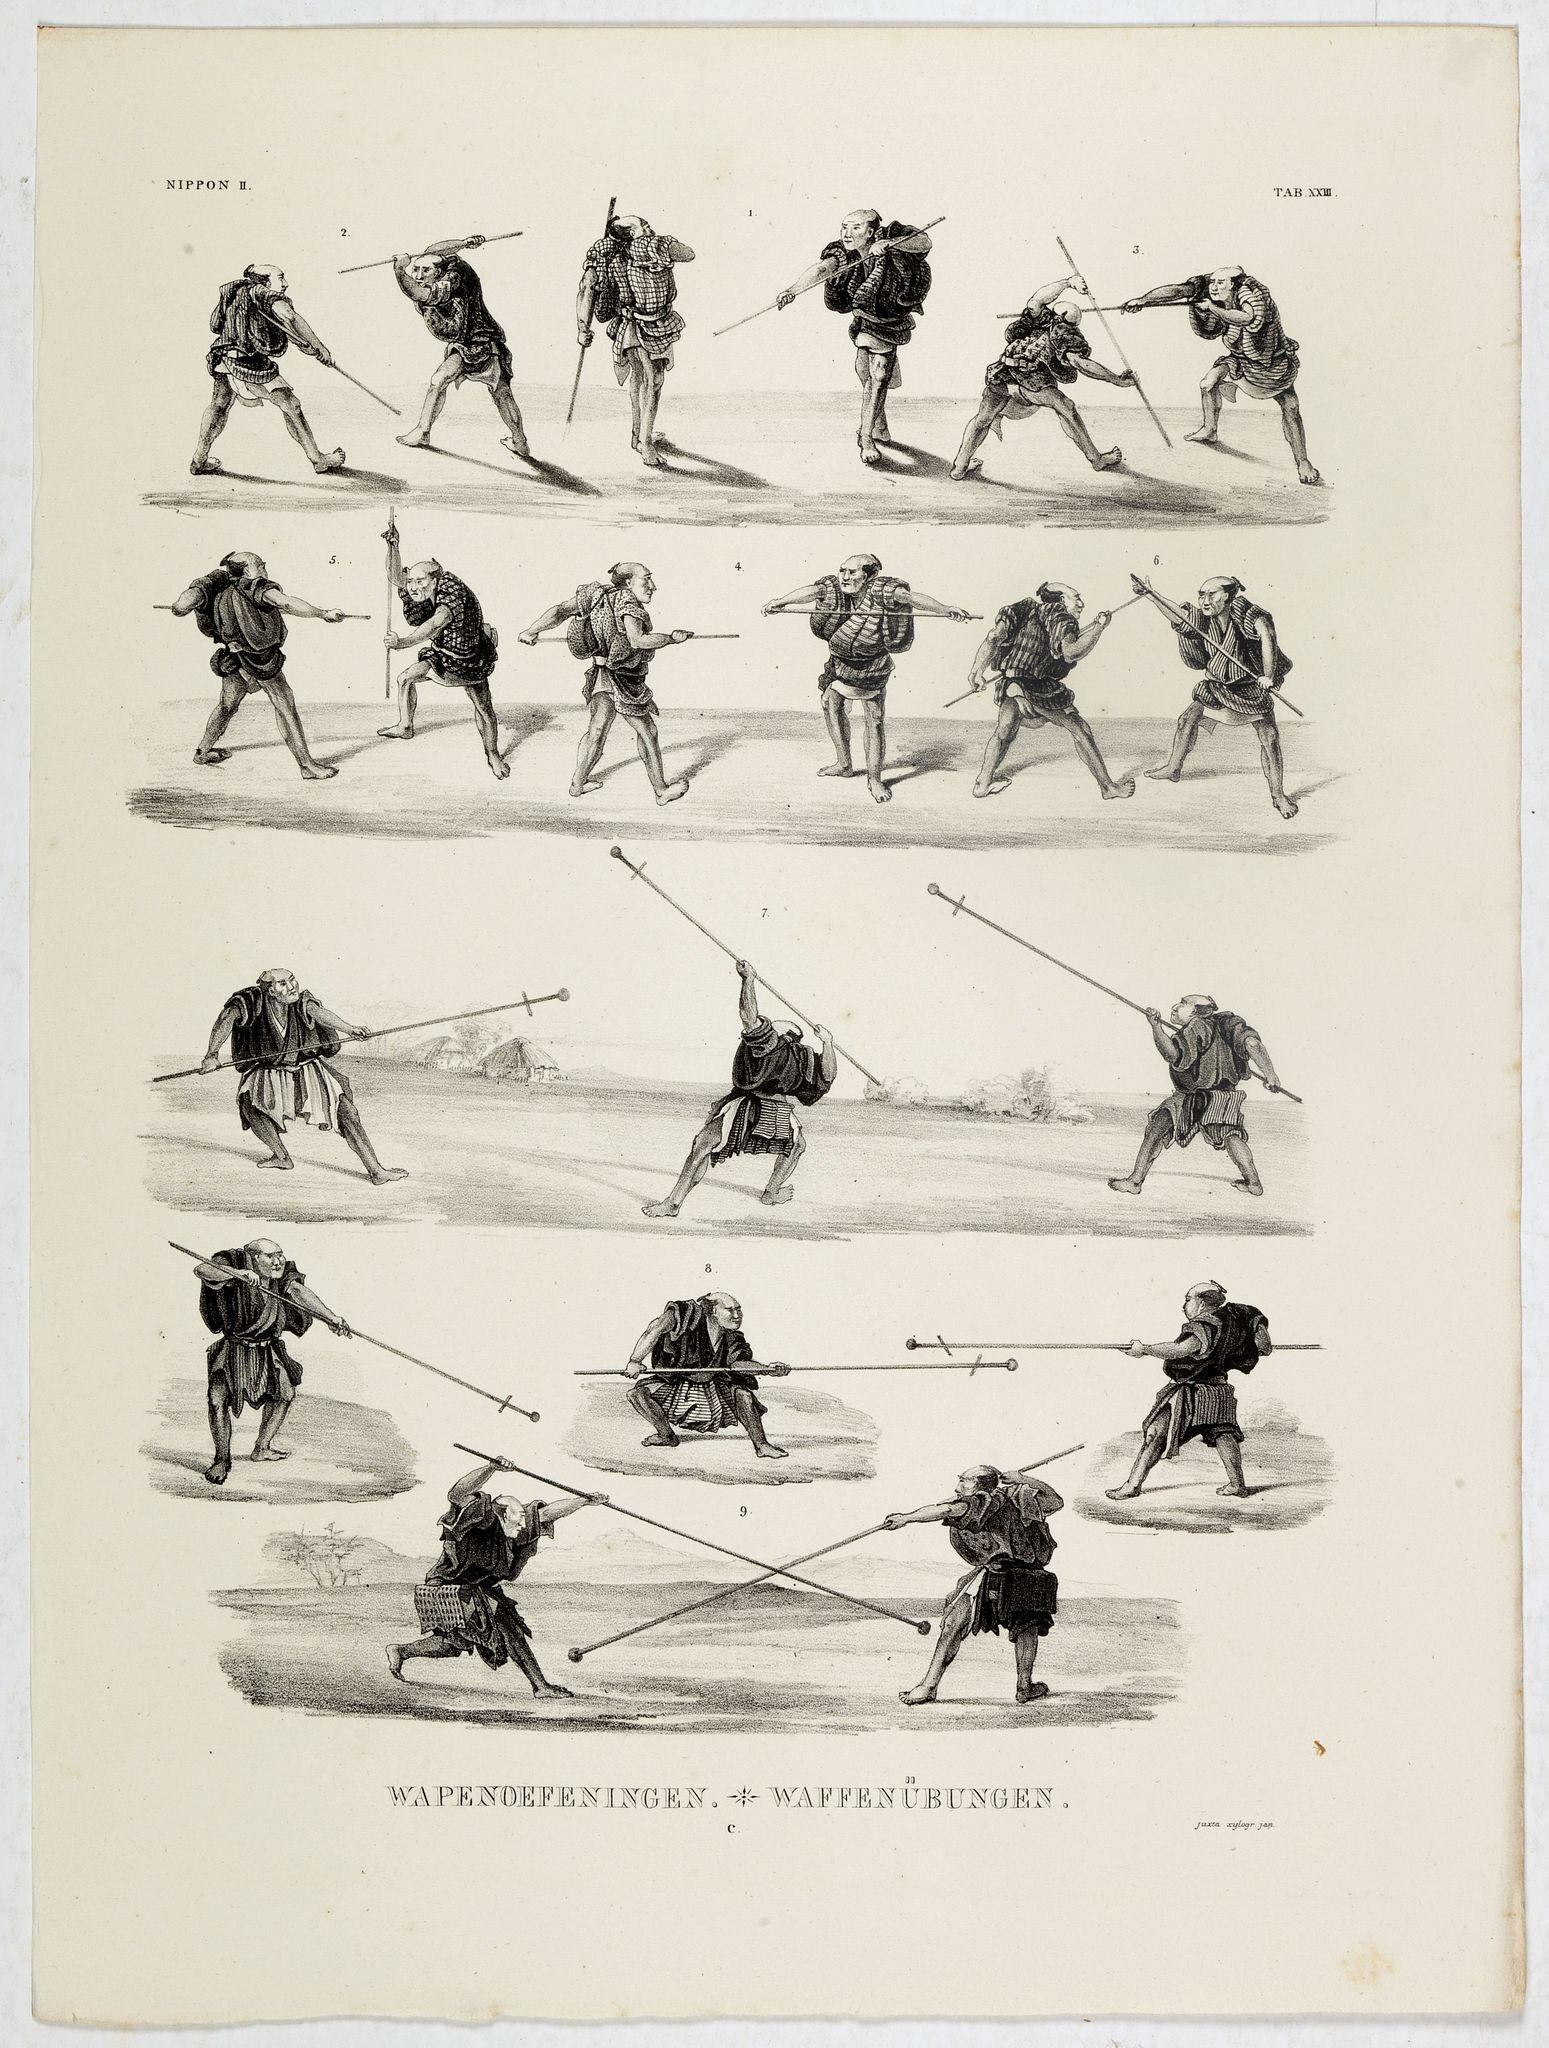 VON SIEBOLD, P.Fr.B. -  Wapenoefeningen - Tab XXIII. (Kendo training)